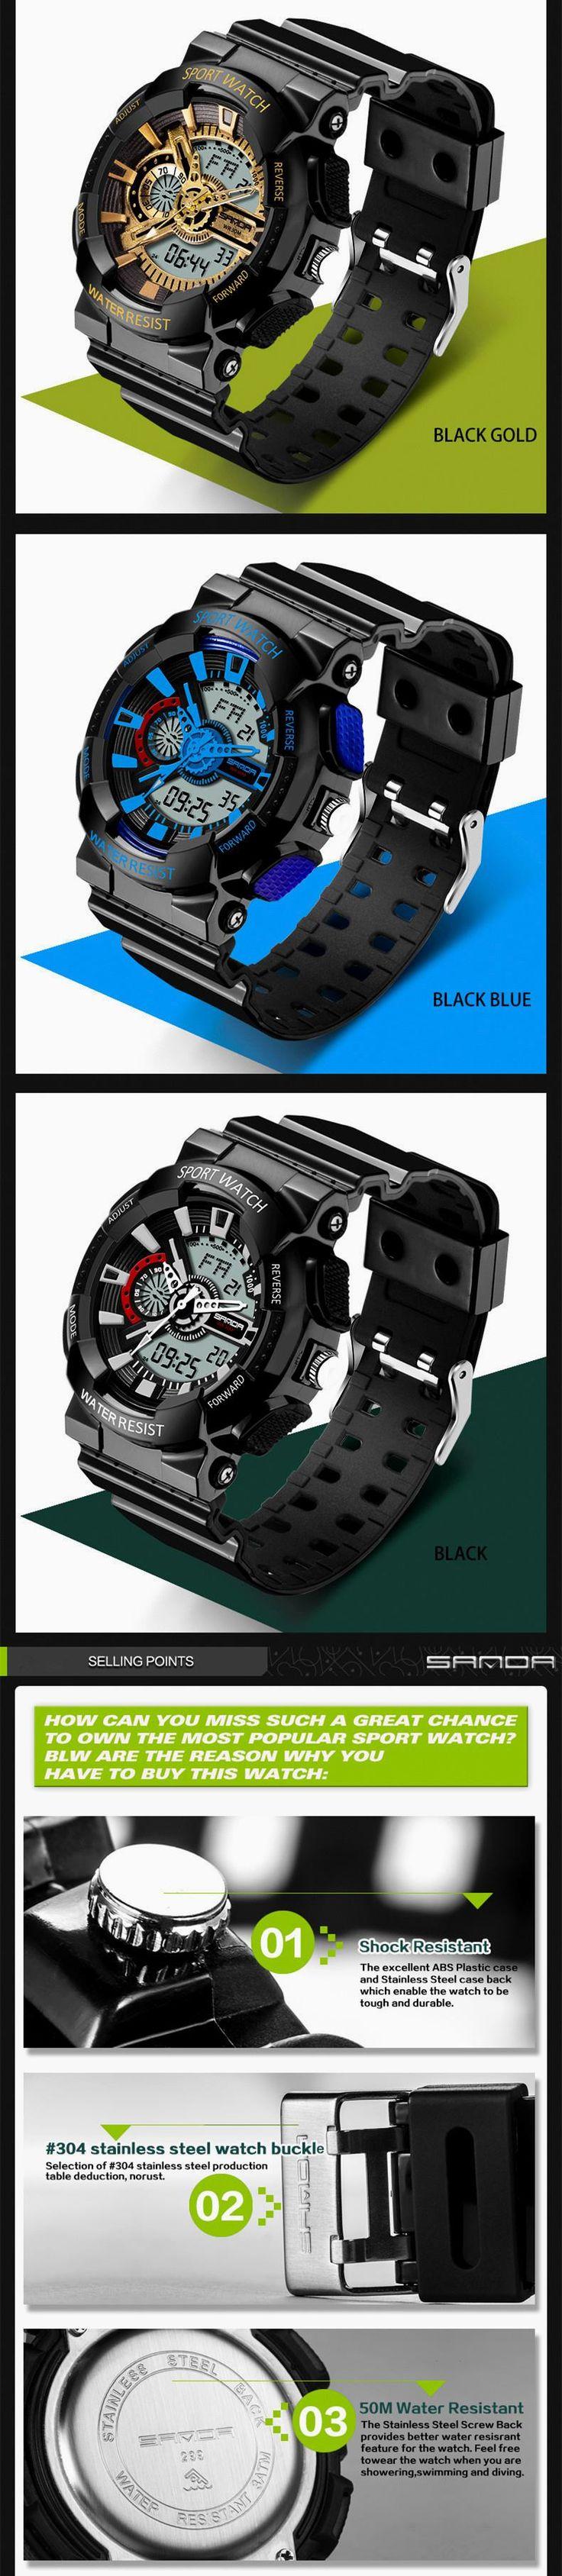 2016 new listing fashion watches men watch waterproof sport military G style S Shock watches men's luxury brand   http://www.dealofthedaytips.com/products/2016-new-listing-fashion-watches-men-watch-waterproof-sport-military-g-style-s-shock-watches-mens-luxury-brand-2/